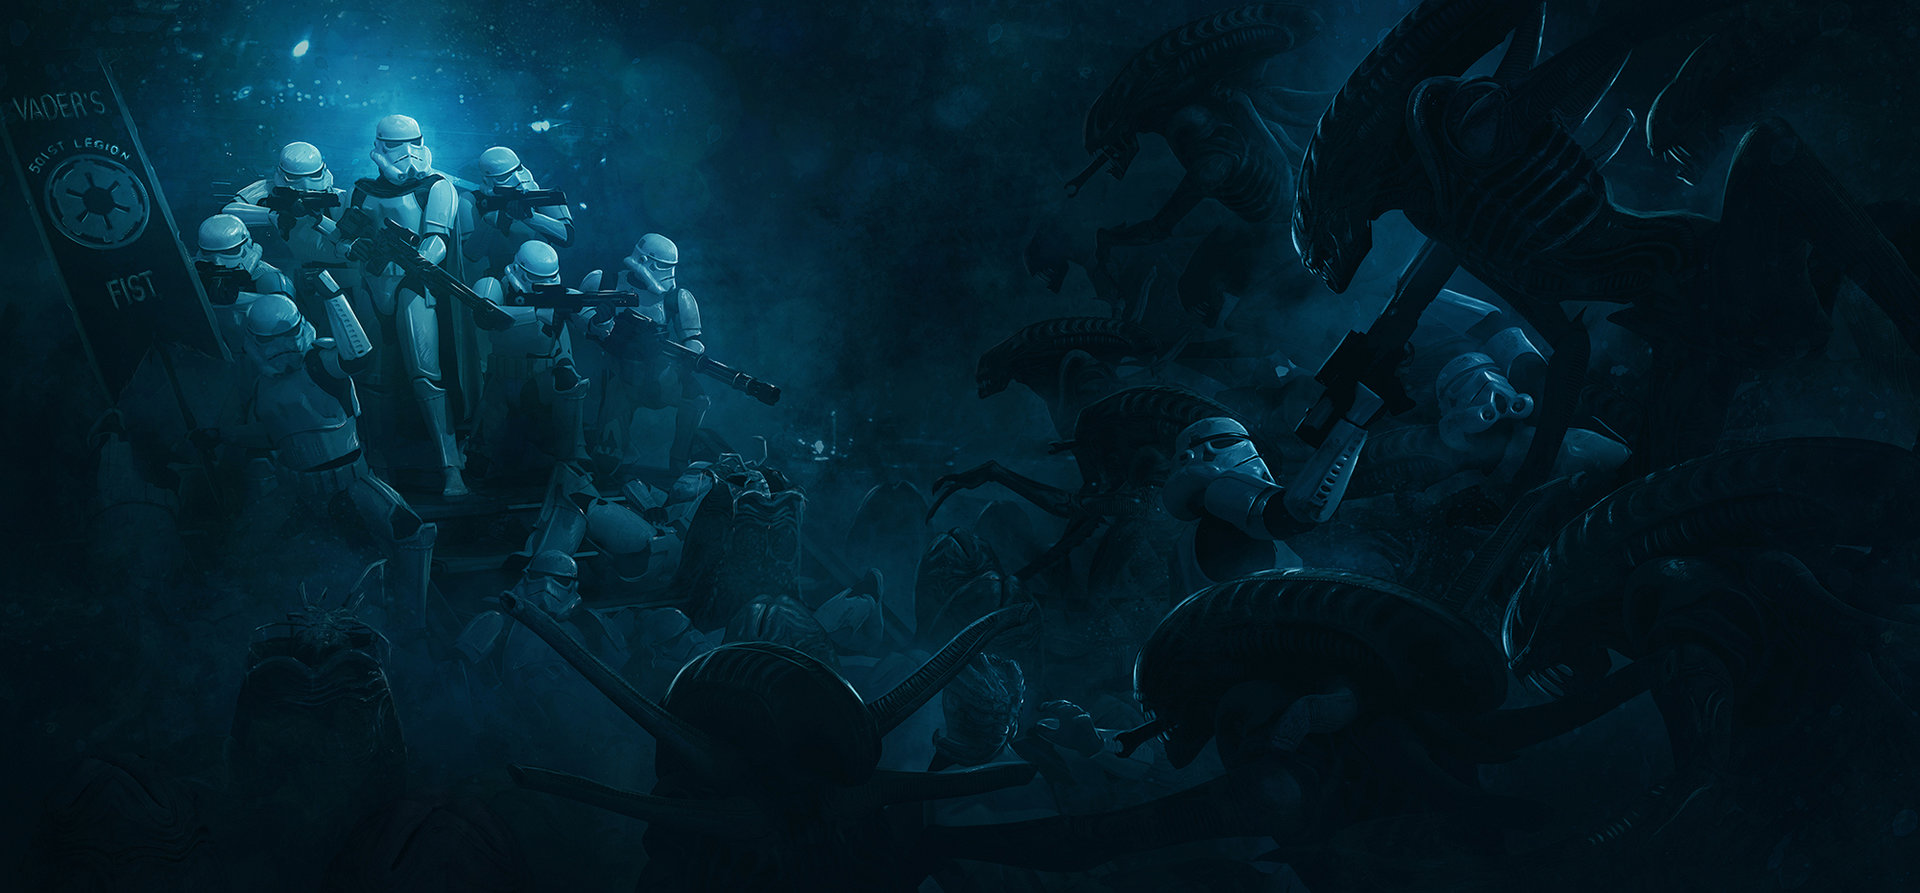 Guillem h pongiluppi guillemhp 501 legion stormtroopers vs aliens